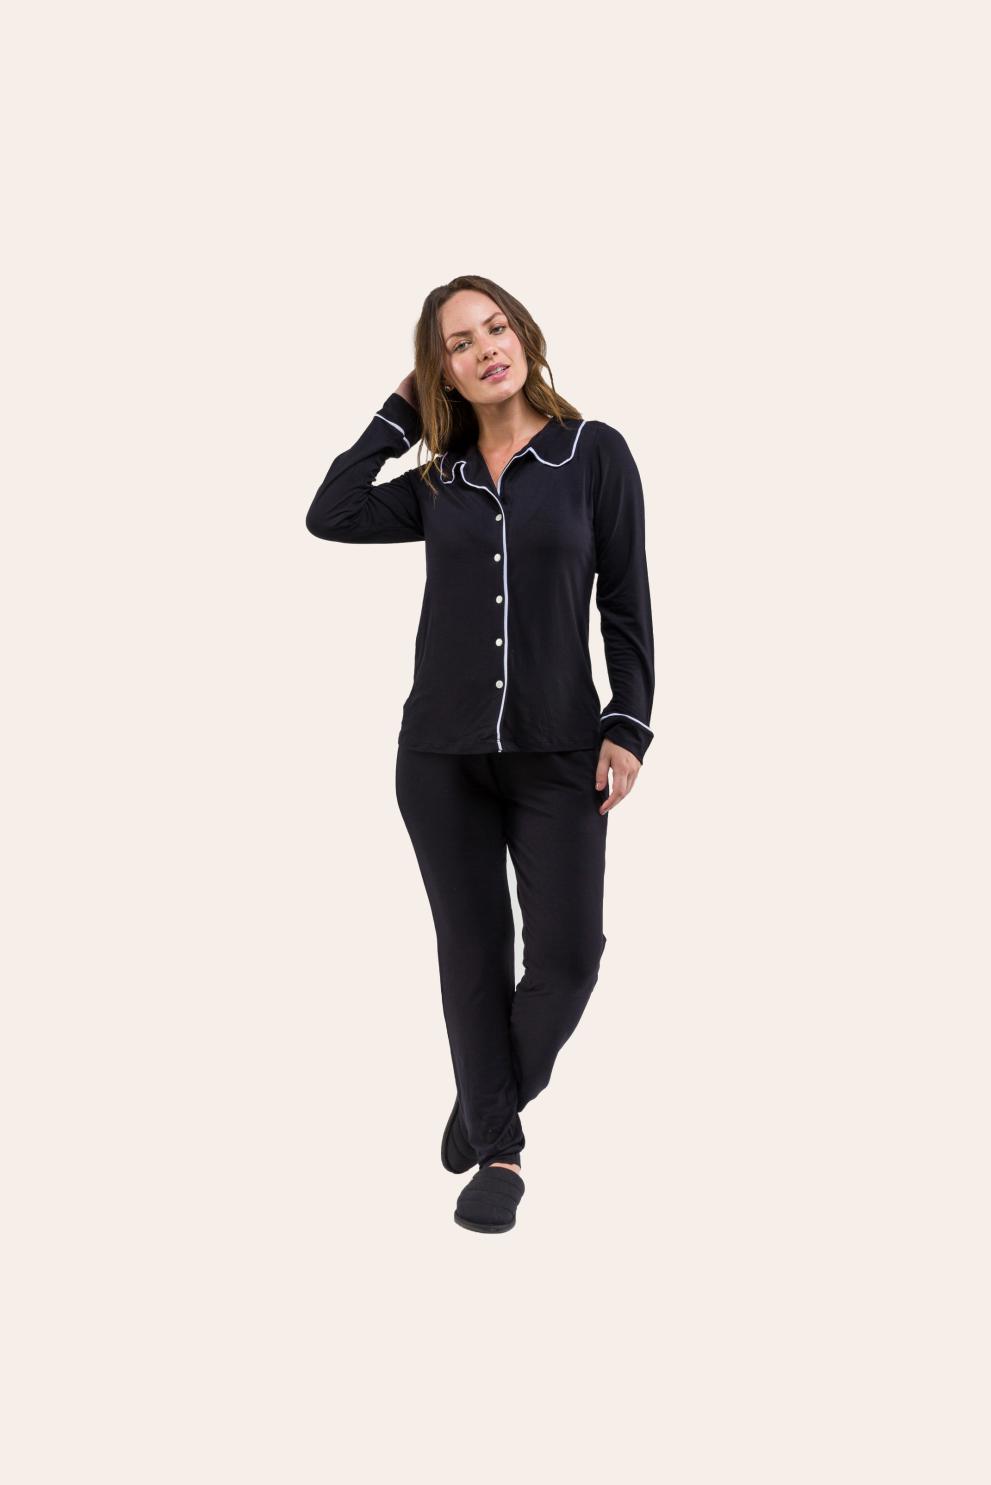 114/B - Pijama Adulto Feminino Longo Comfy Viscolycra